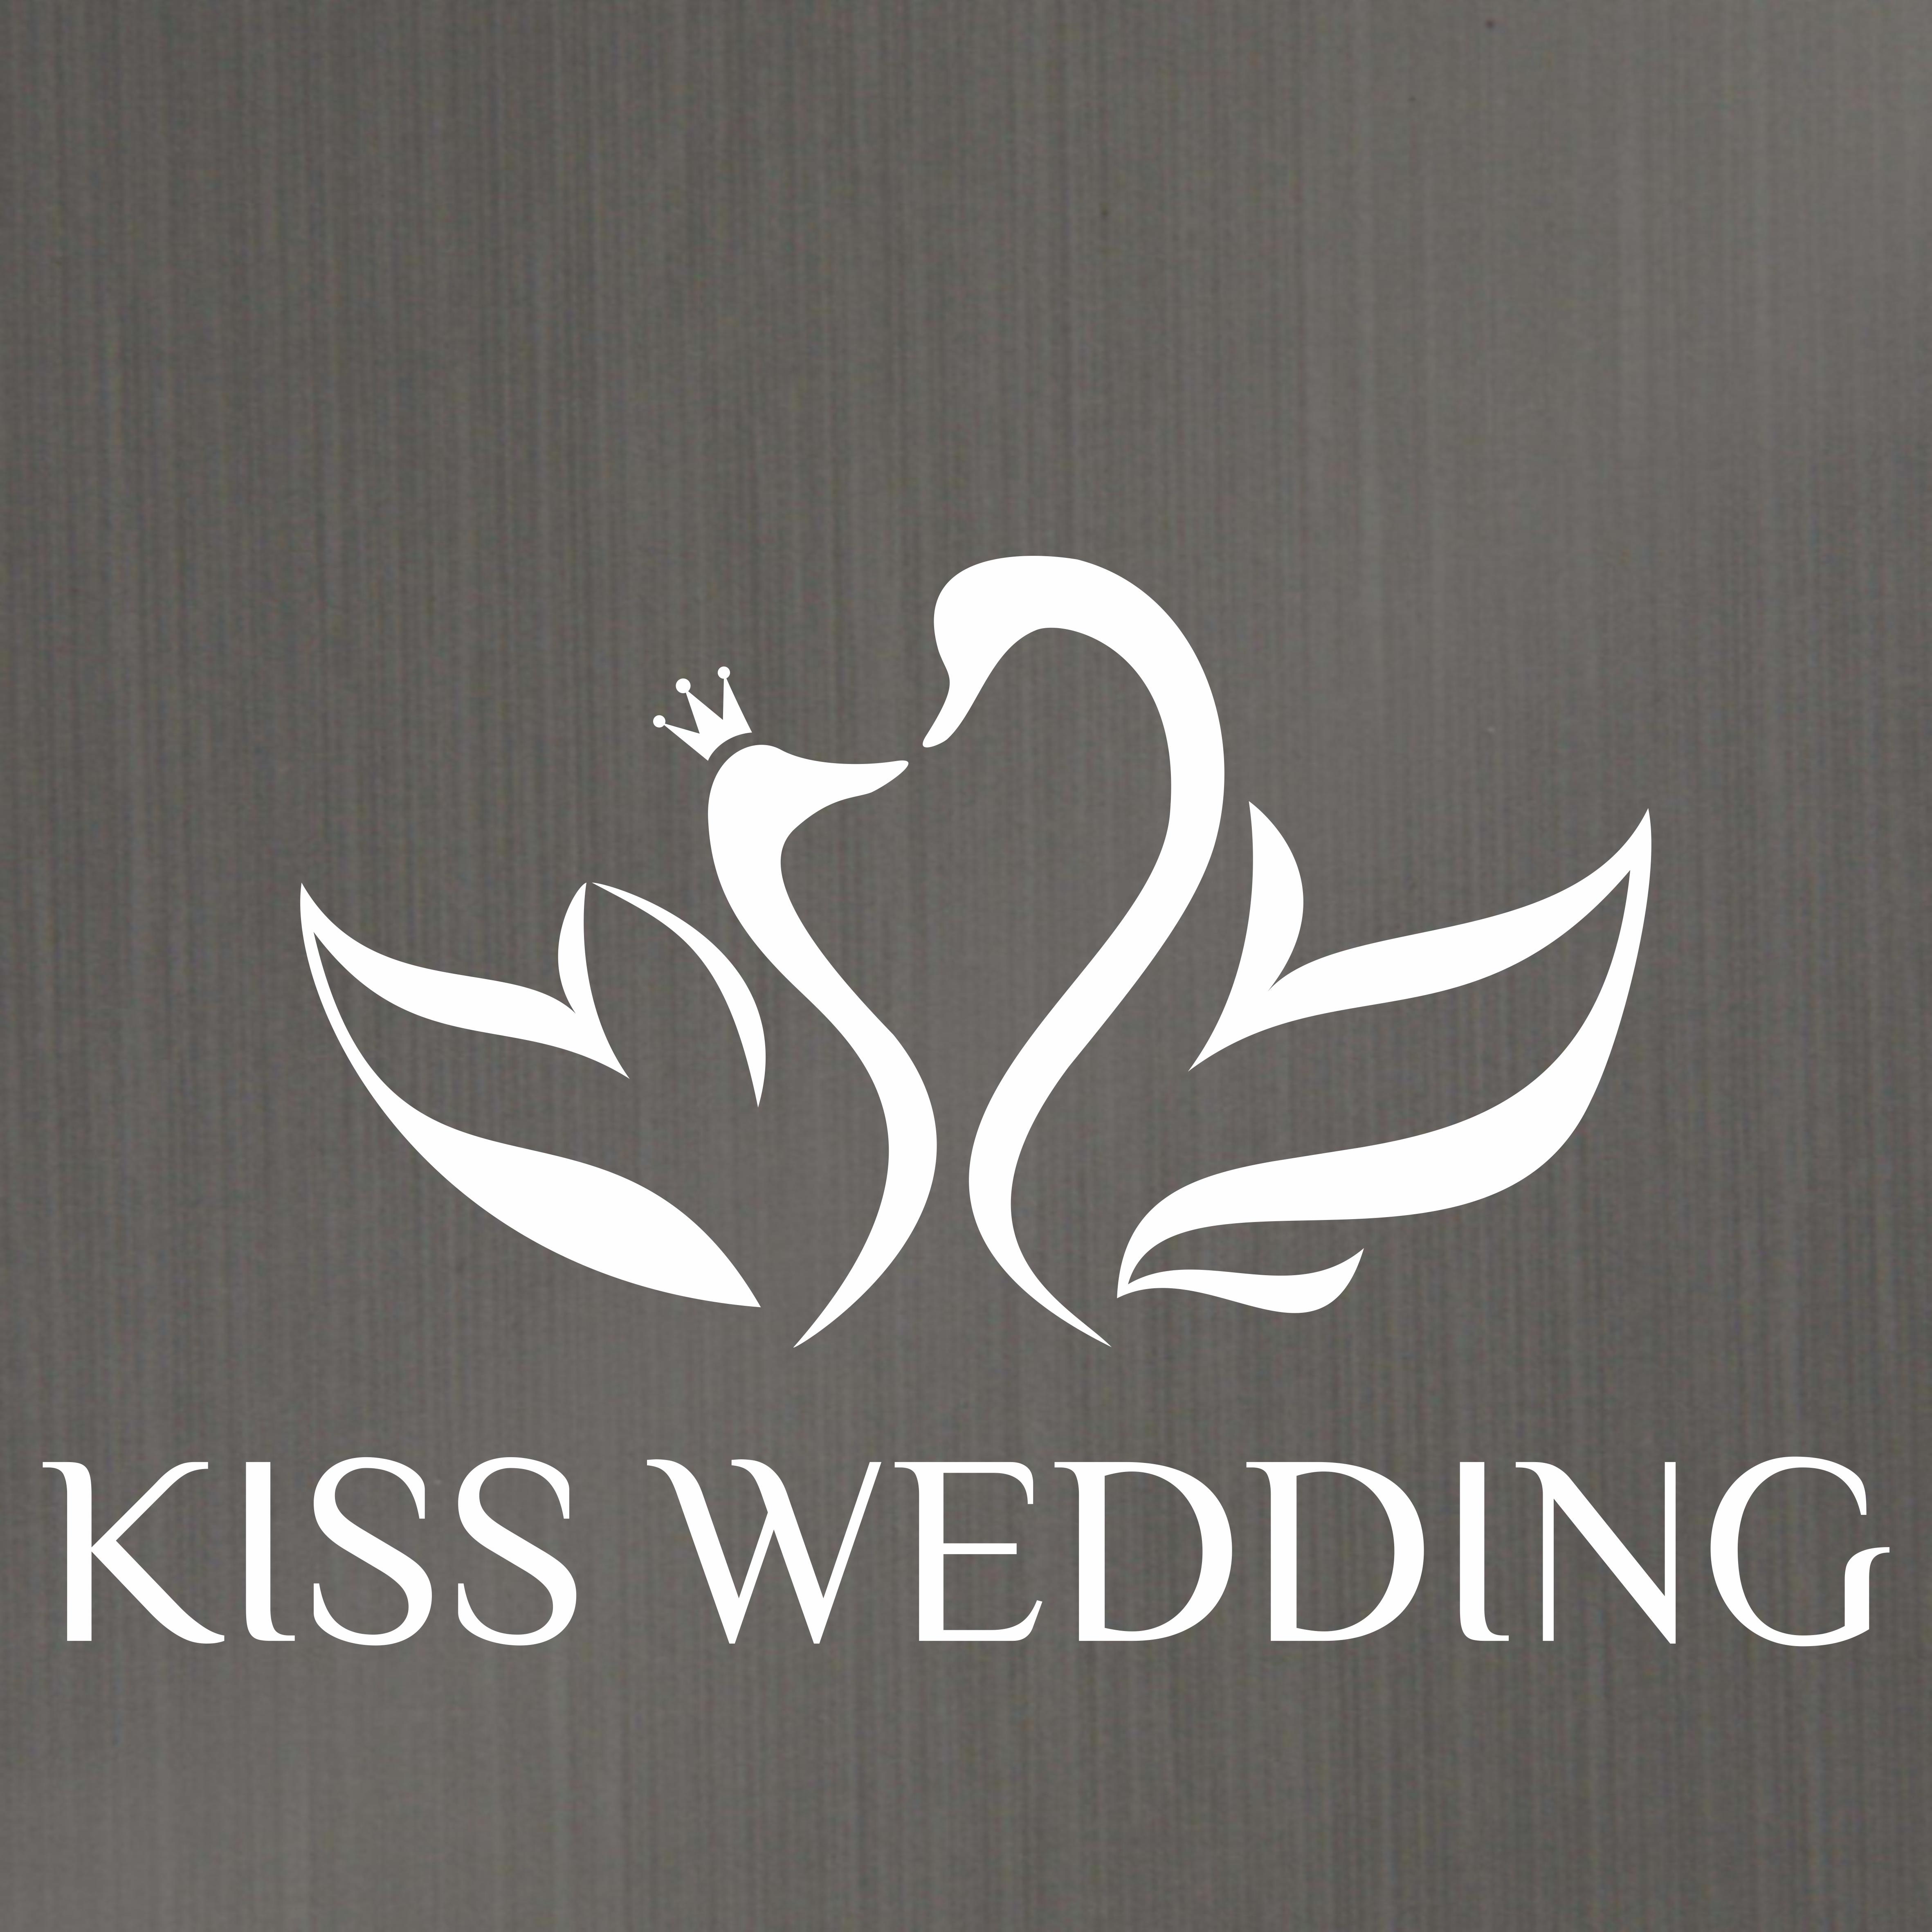 凯诺婚礼KissWedding